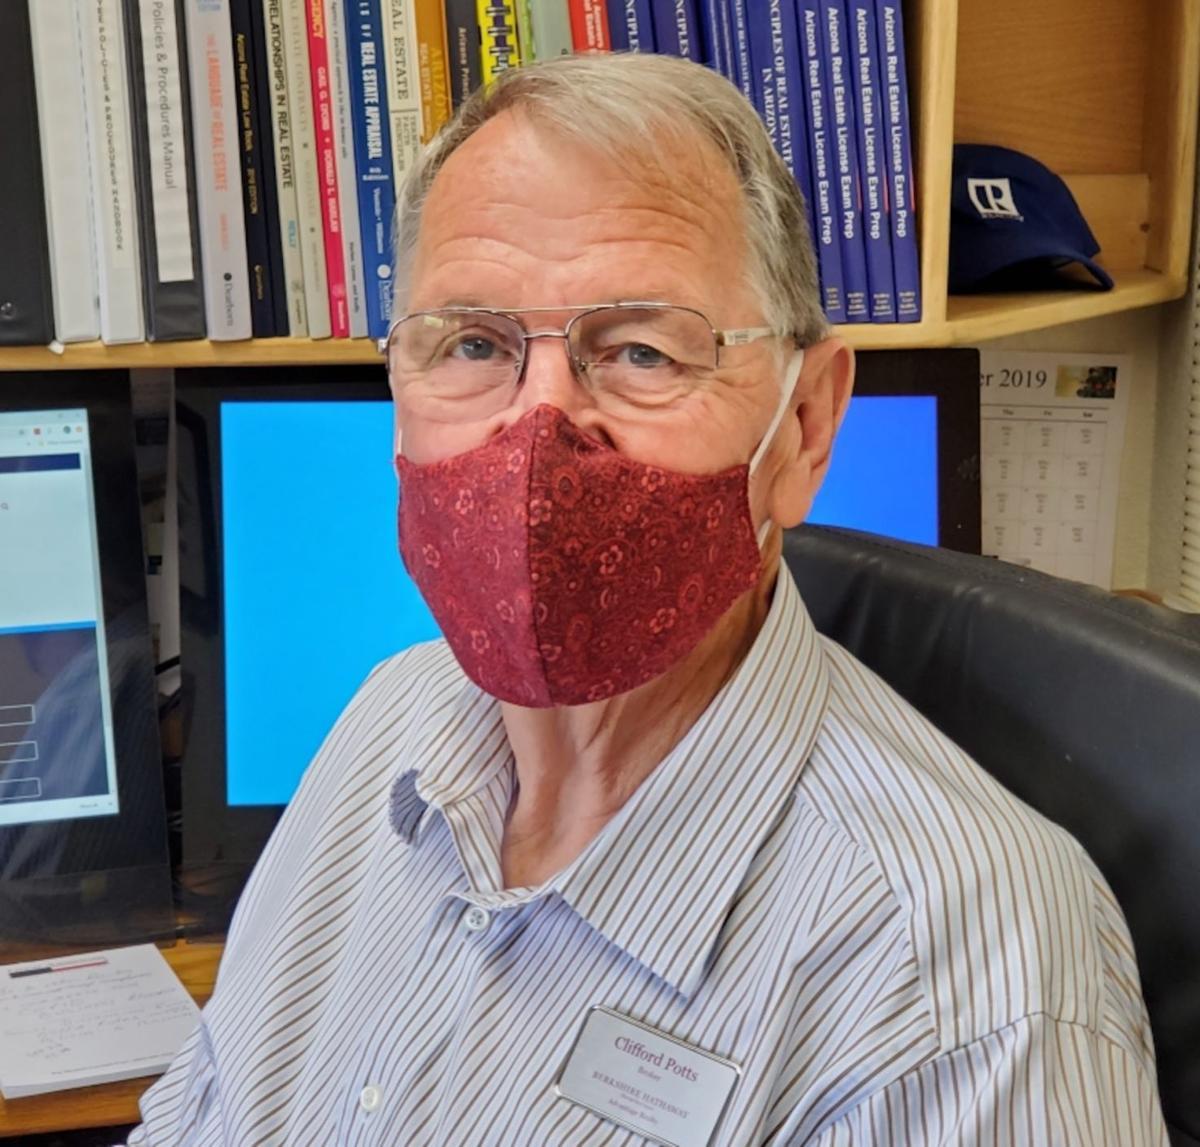 Cliff Potts in mask